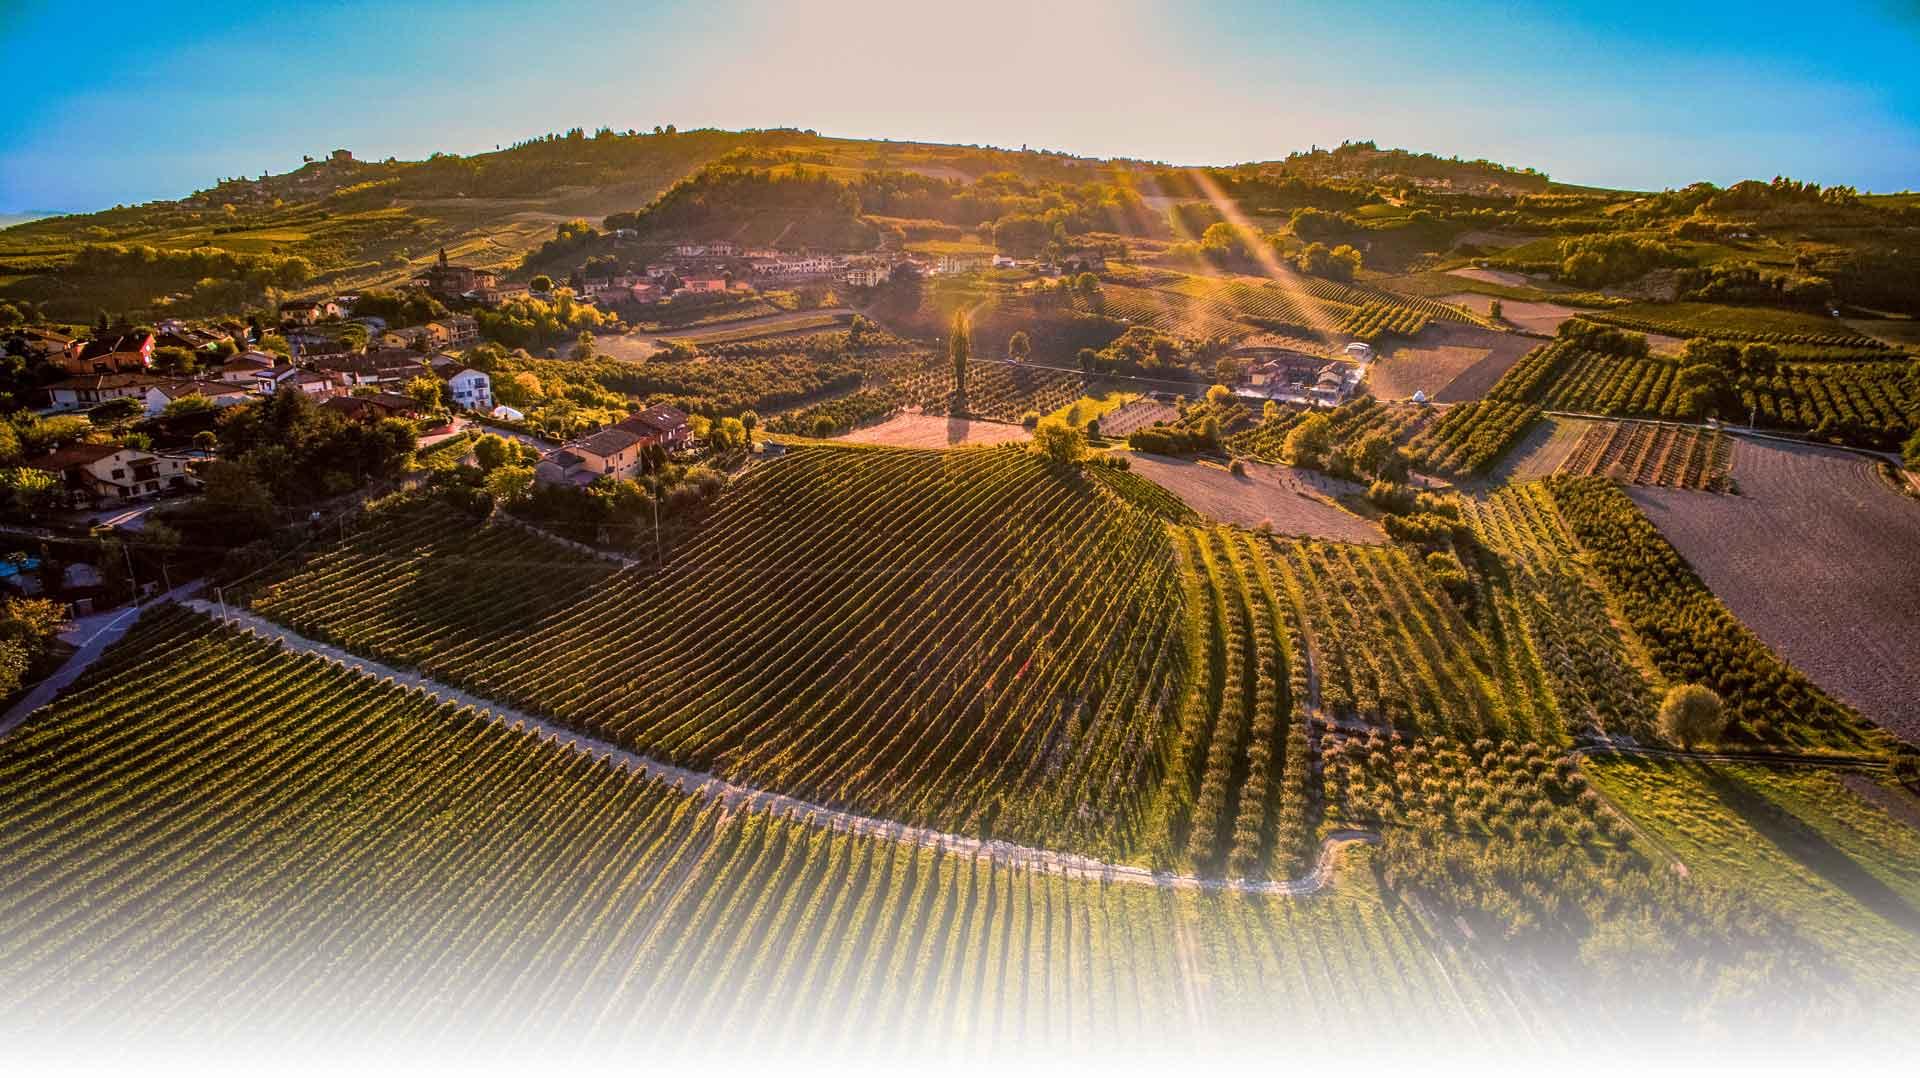 massucco-azienda vinicola lange cuneo